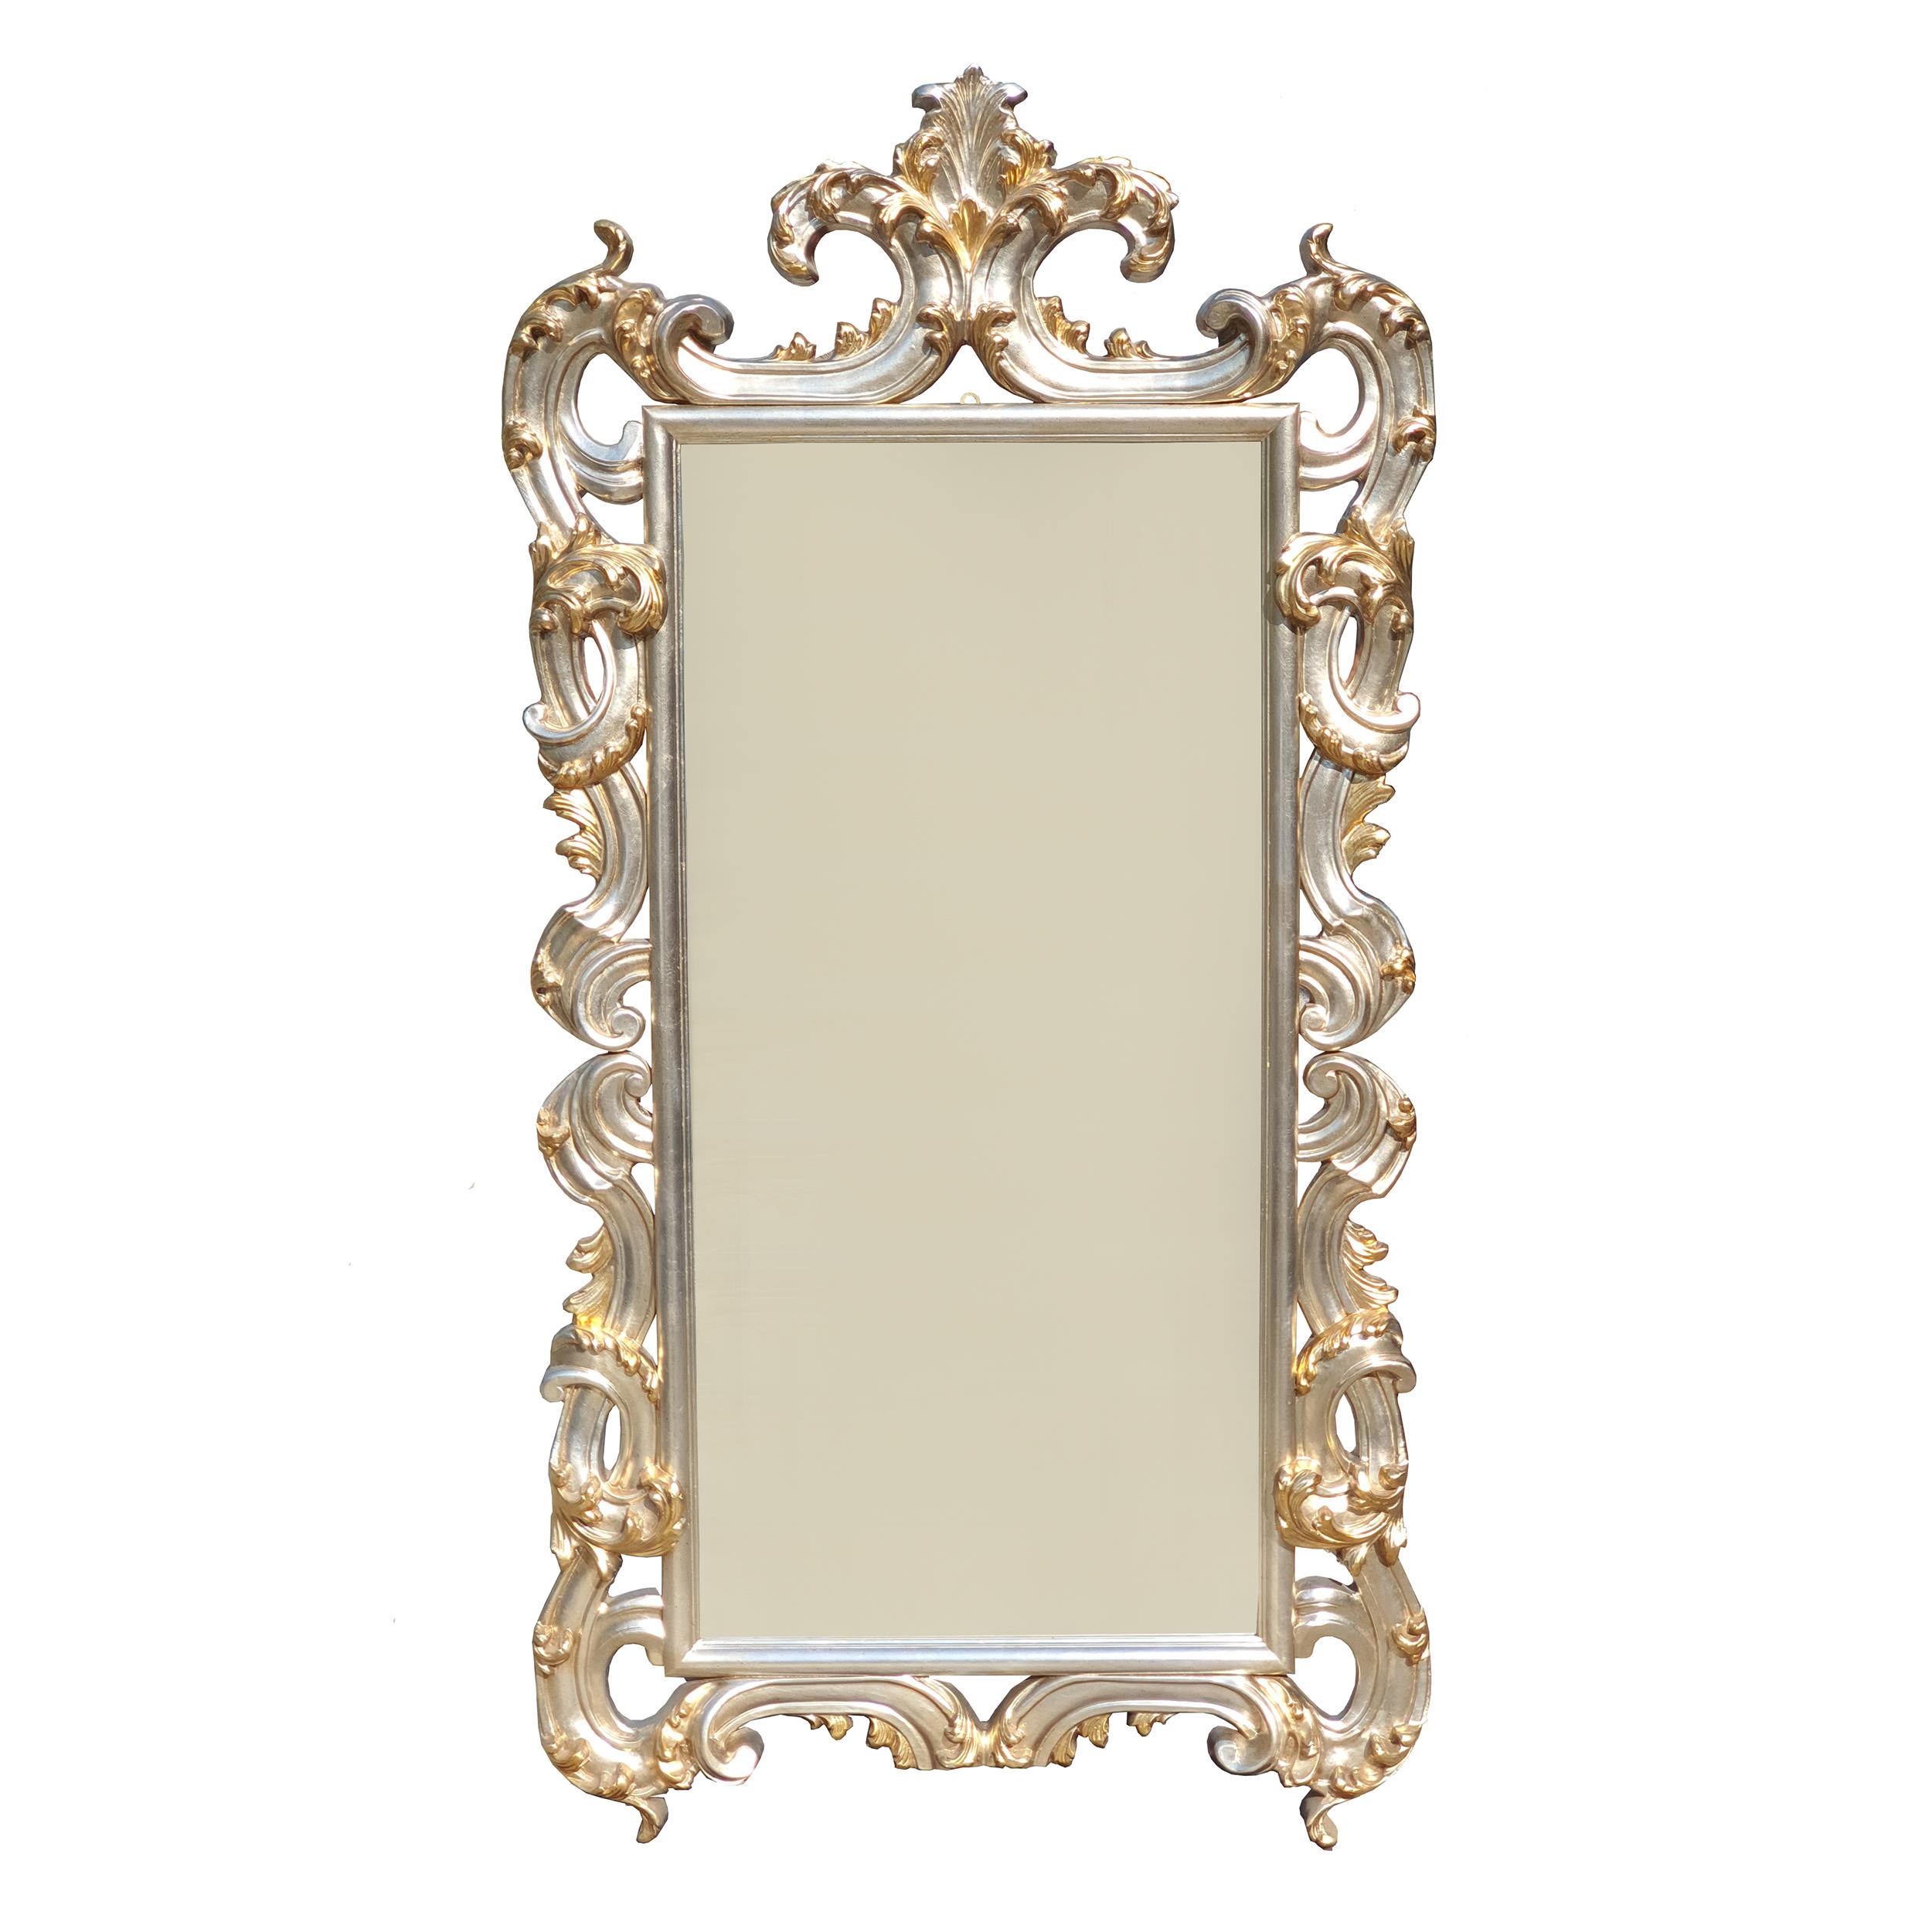 آینه مدل king